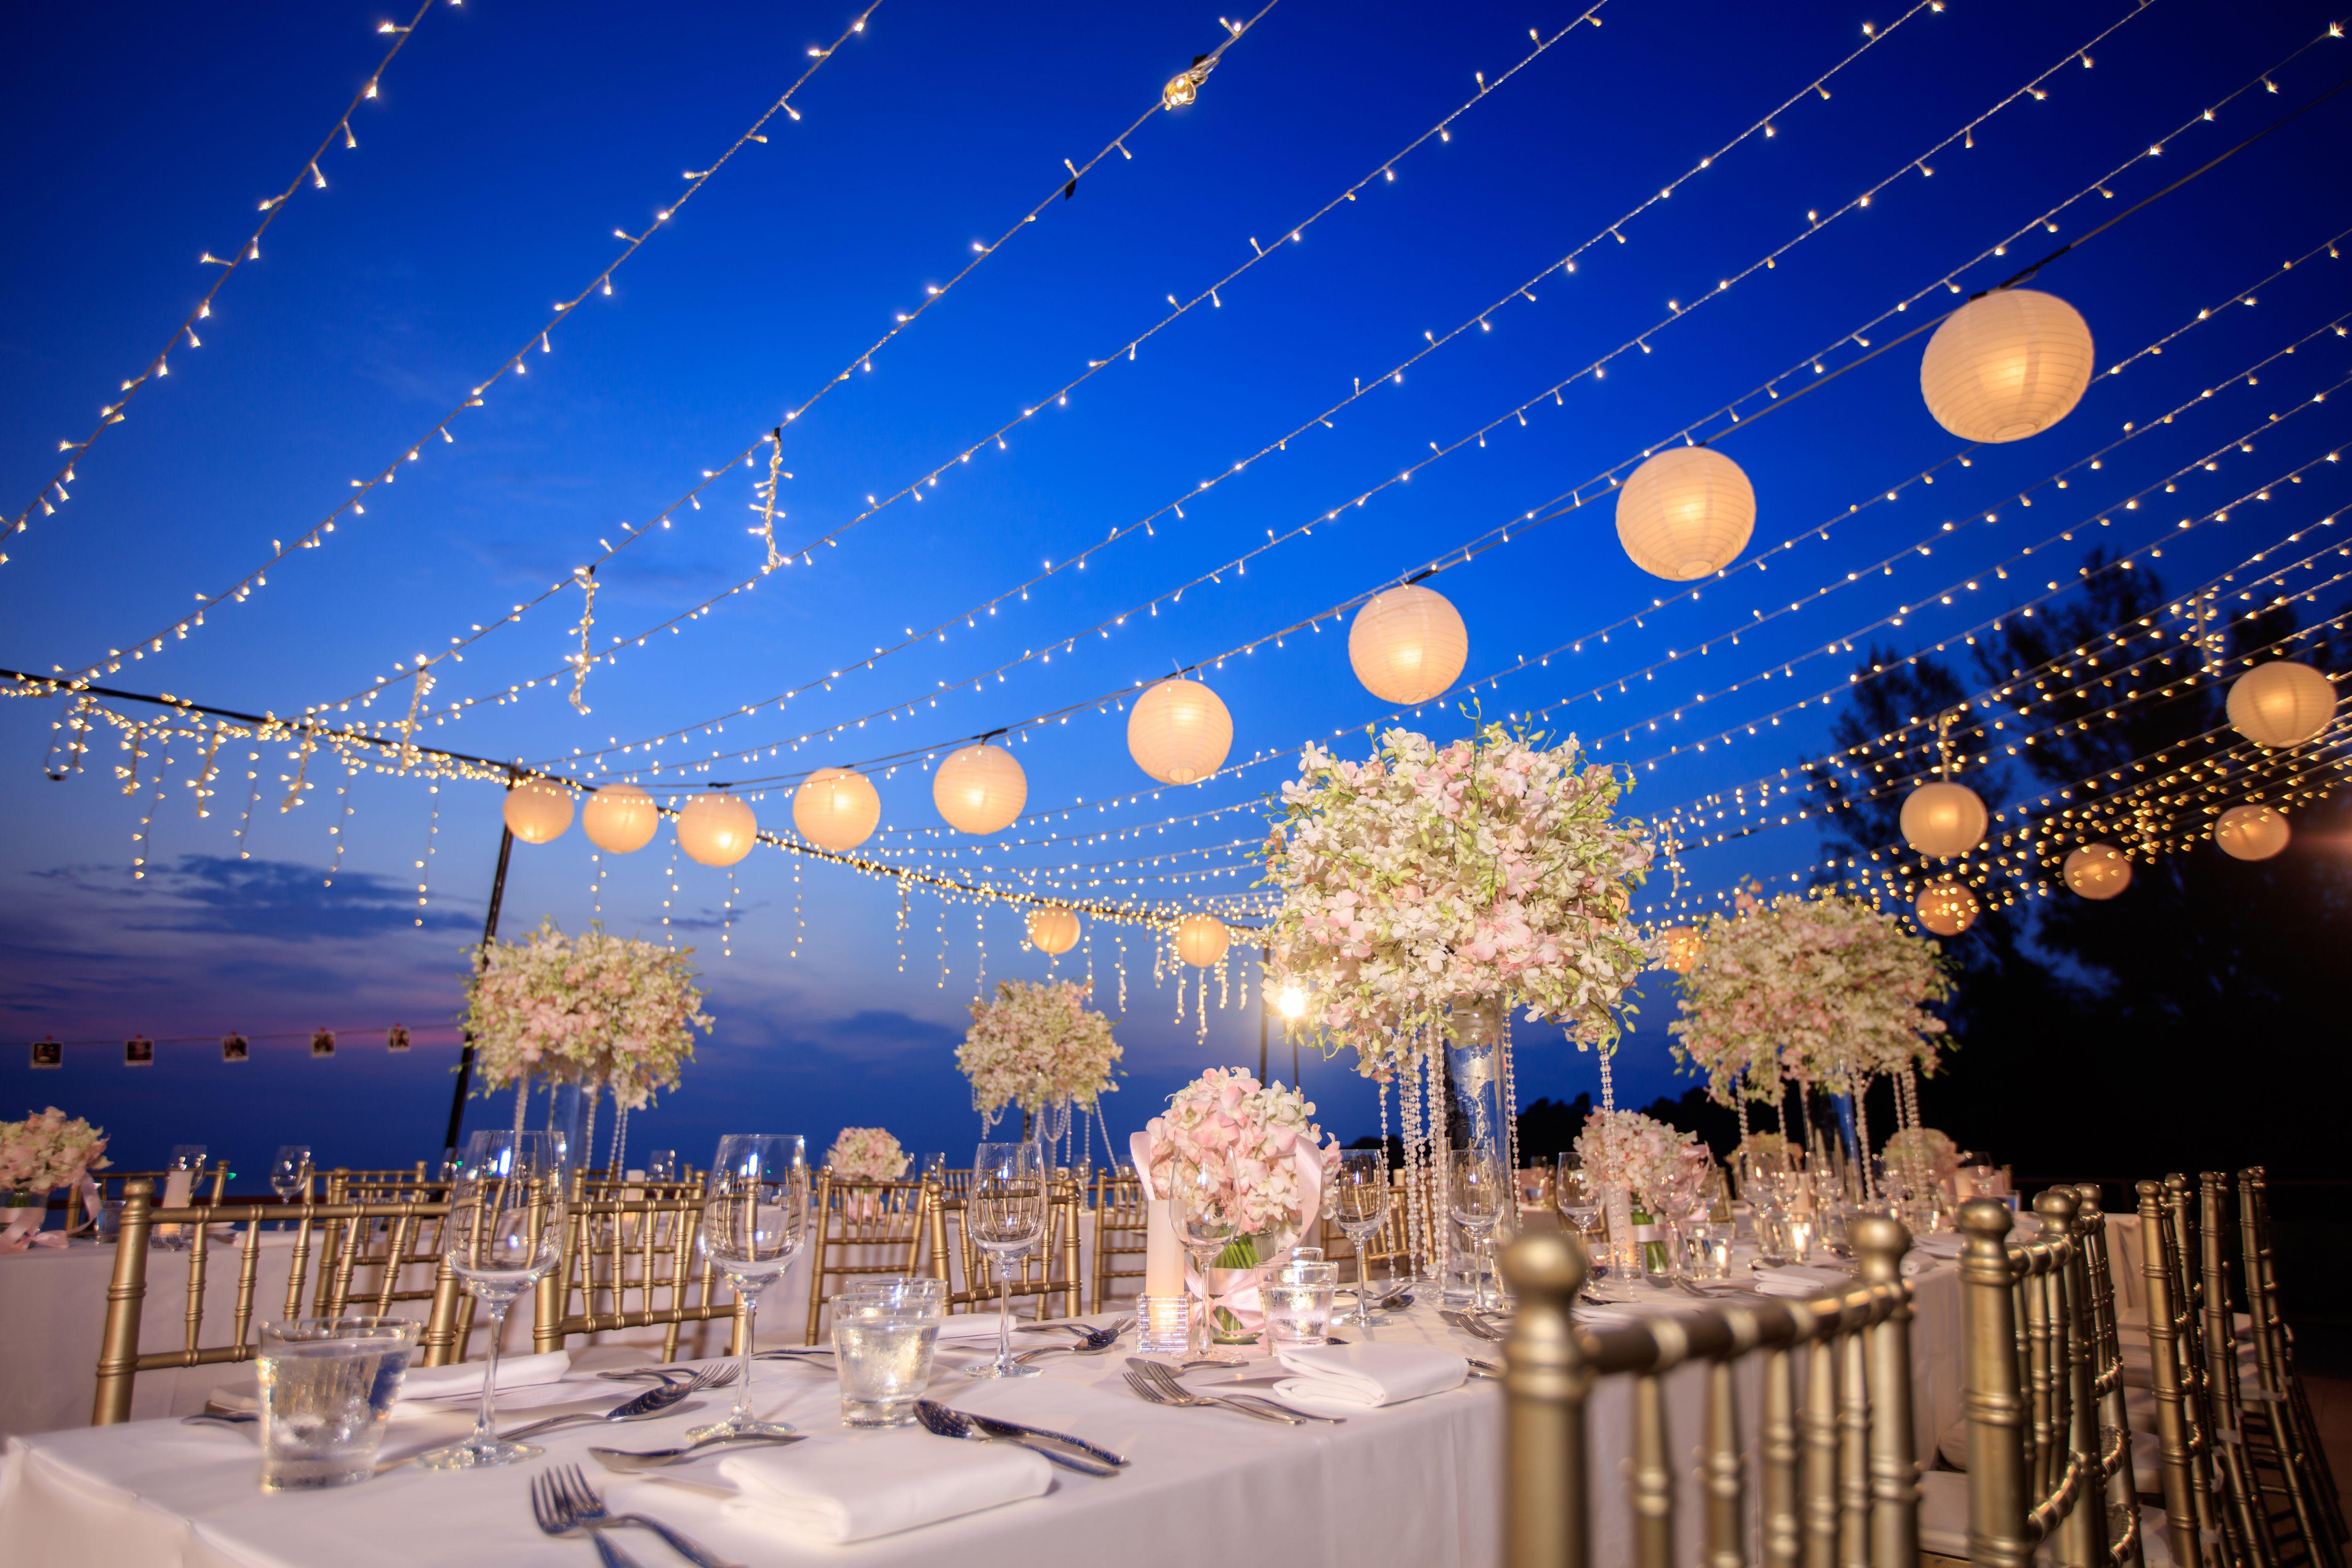 Little lights at your wedding / Pequeñas luces iluminan tu boda #Barceloweddings #weddings #lights #sky #blue